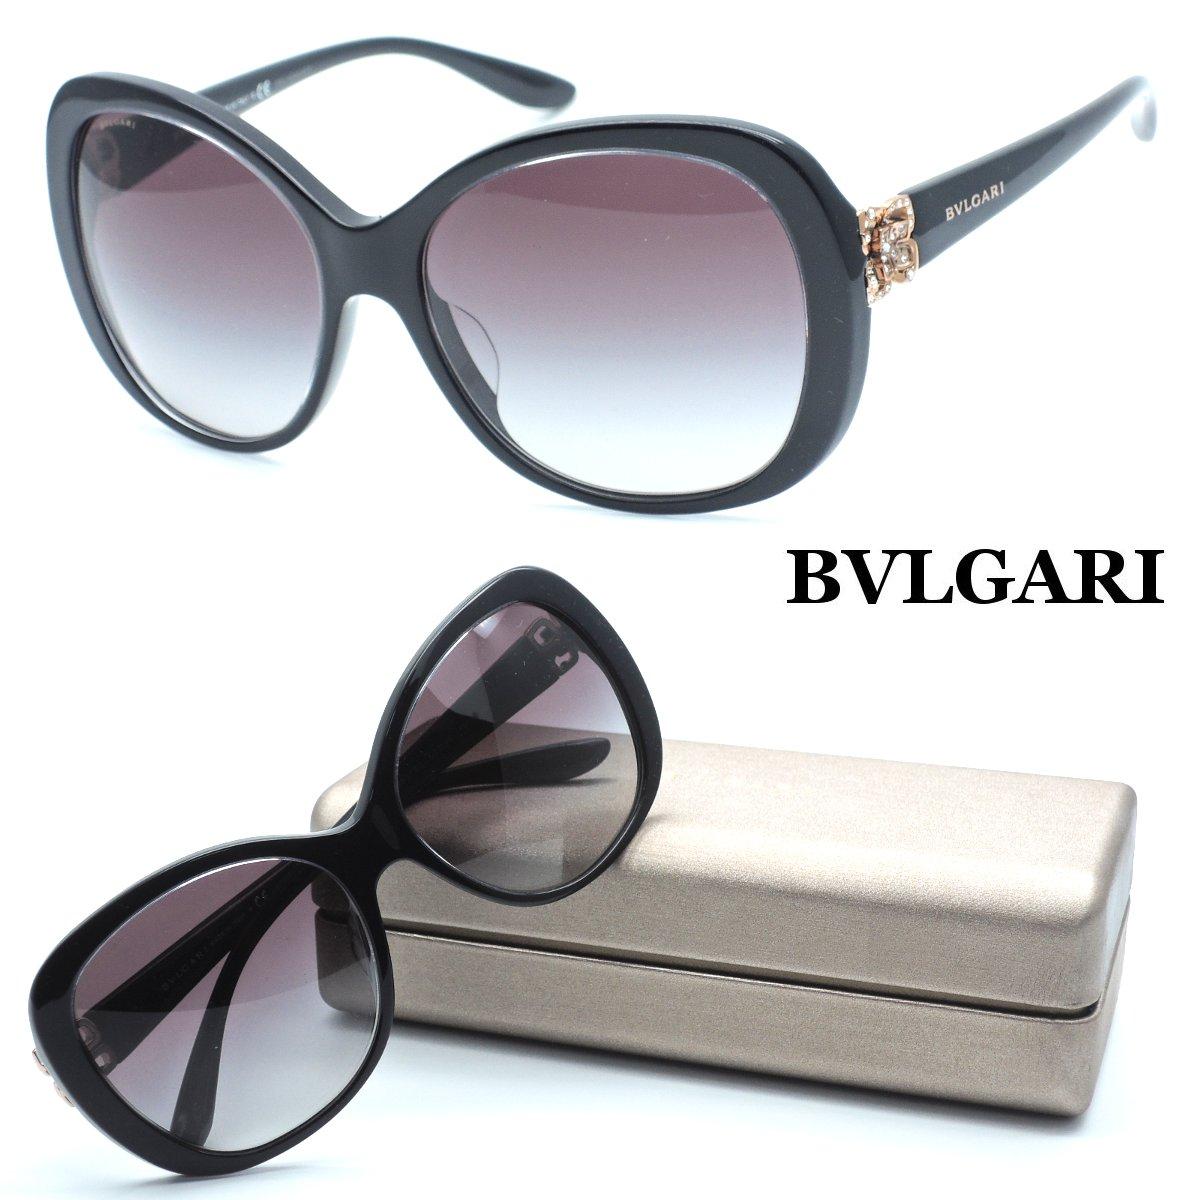 【BVLGARI】 ブルガリ サングラス BV8171-B-F col.5383/8G【正規代理店商品】【店内全品送料無料】